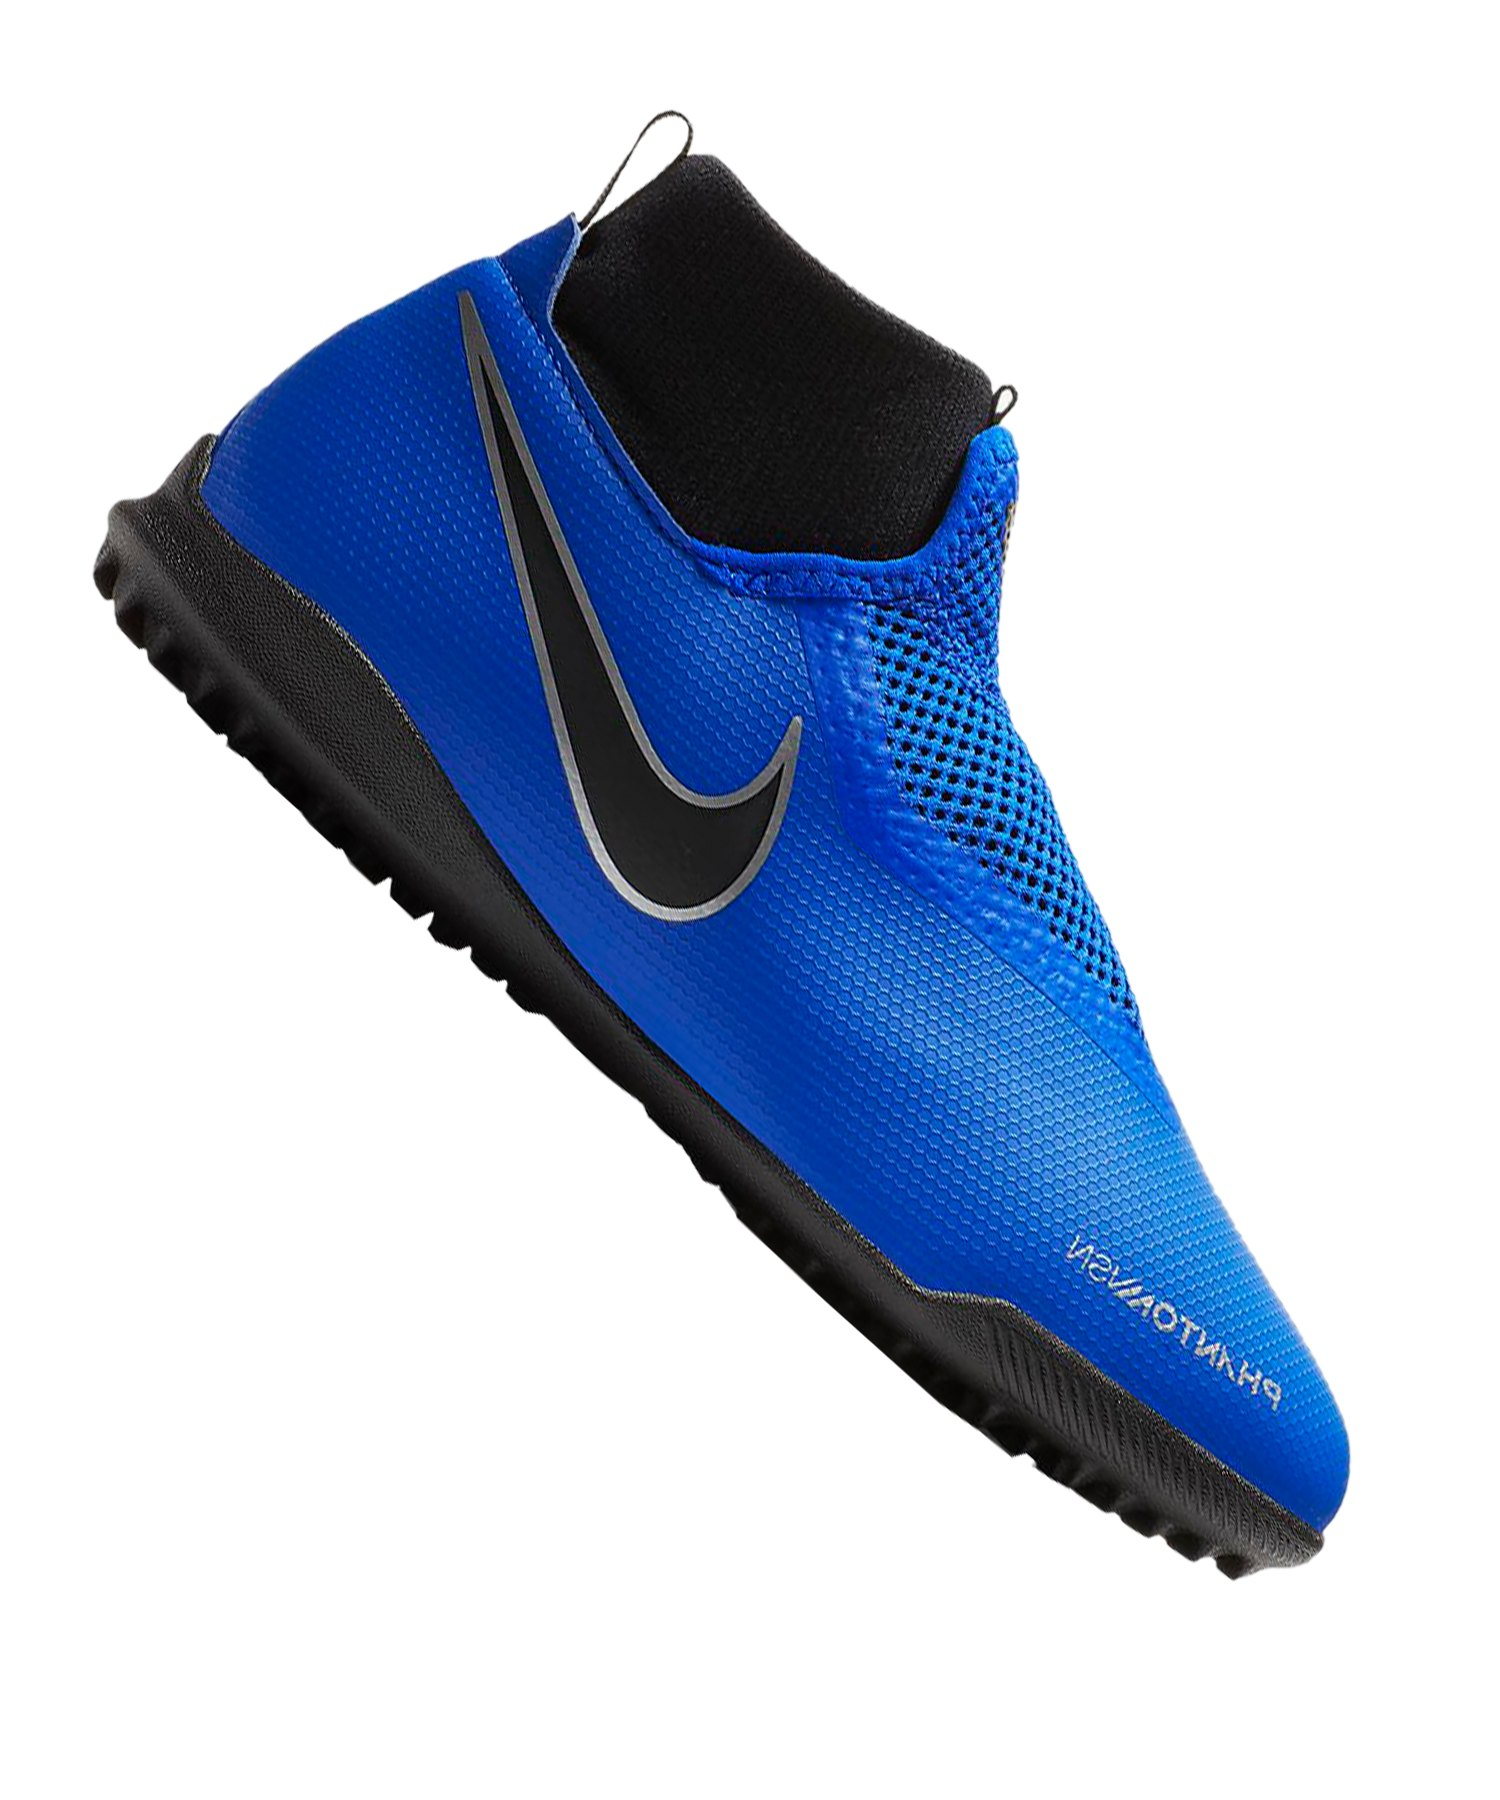 c99cce399b71 Nike Jr Phantom Vision Academy DF TF Kids Blau F400 - blau